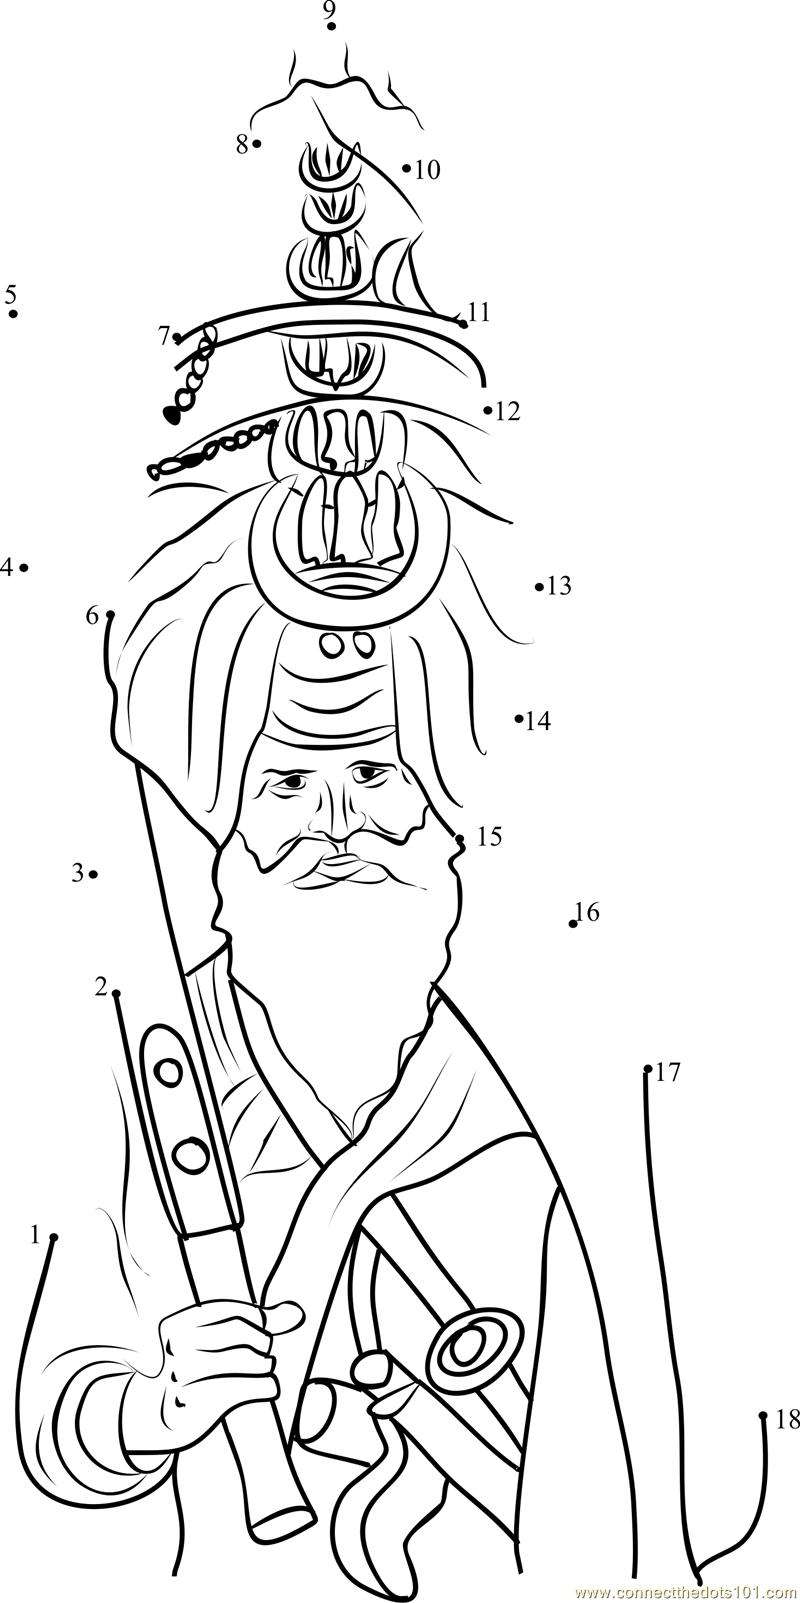 Sikh pagri dot to dot Printable Worksheet ConnectTheDots101.com